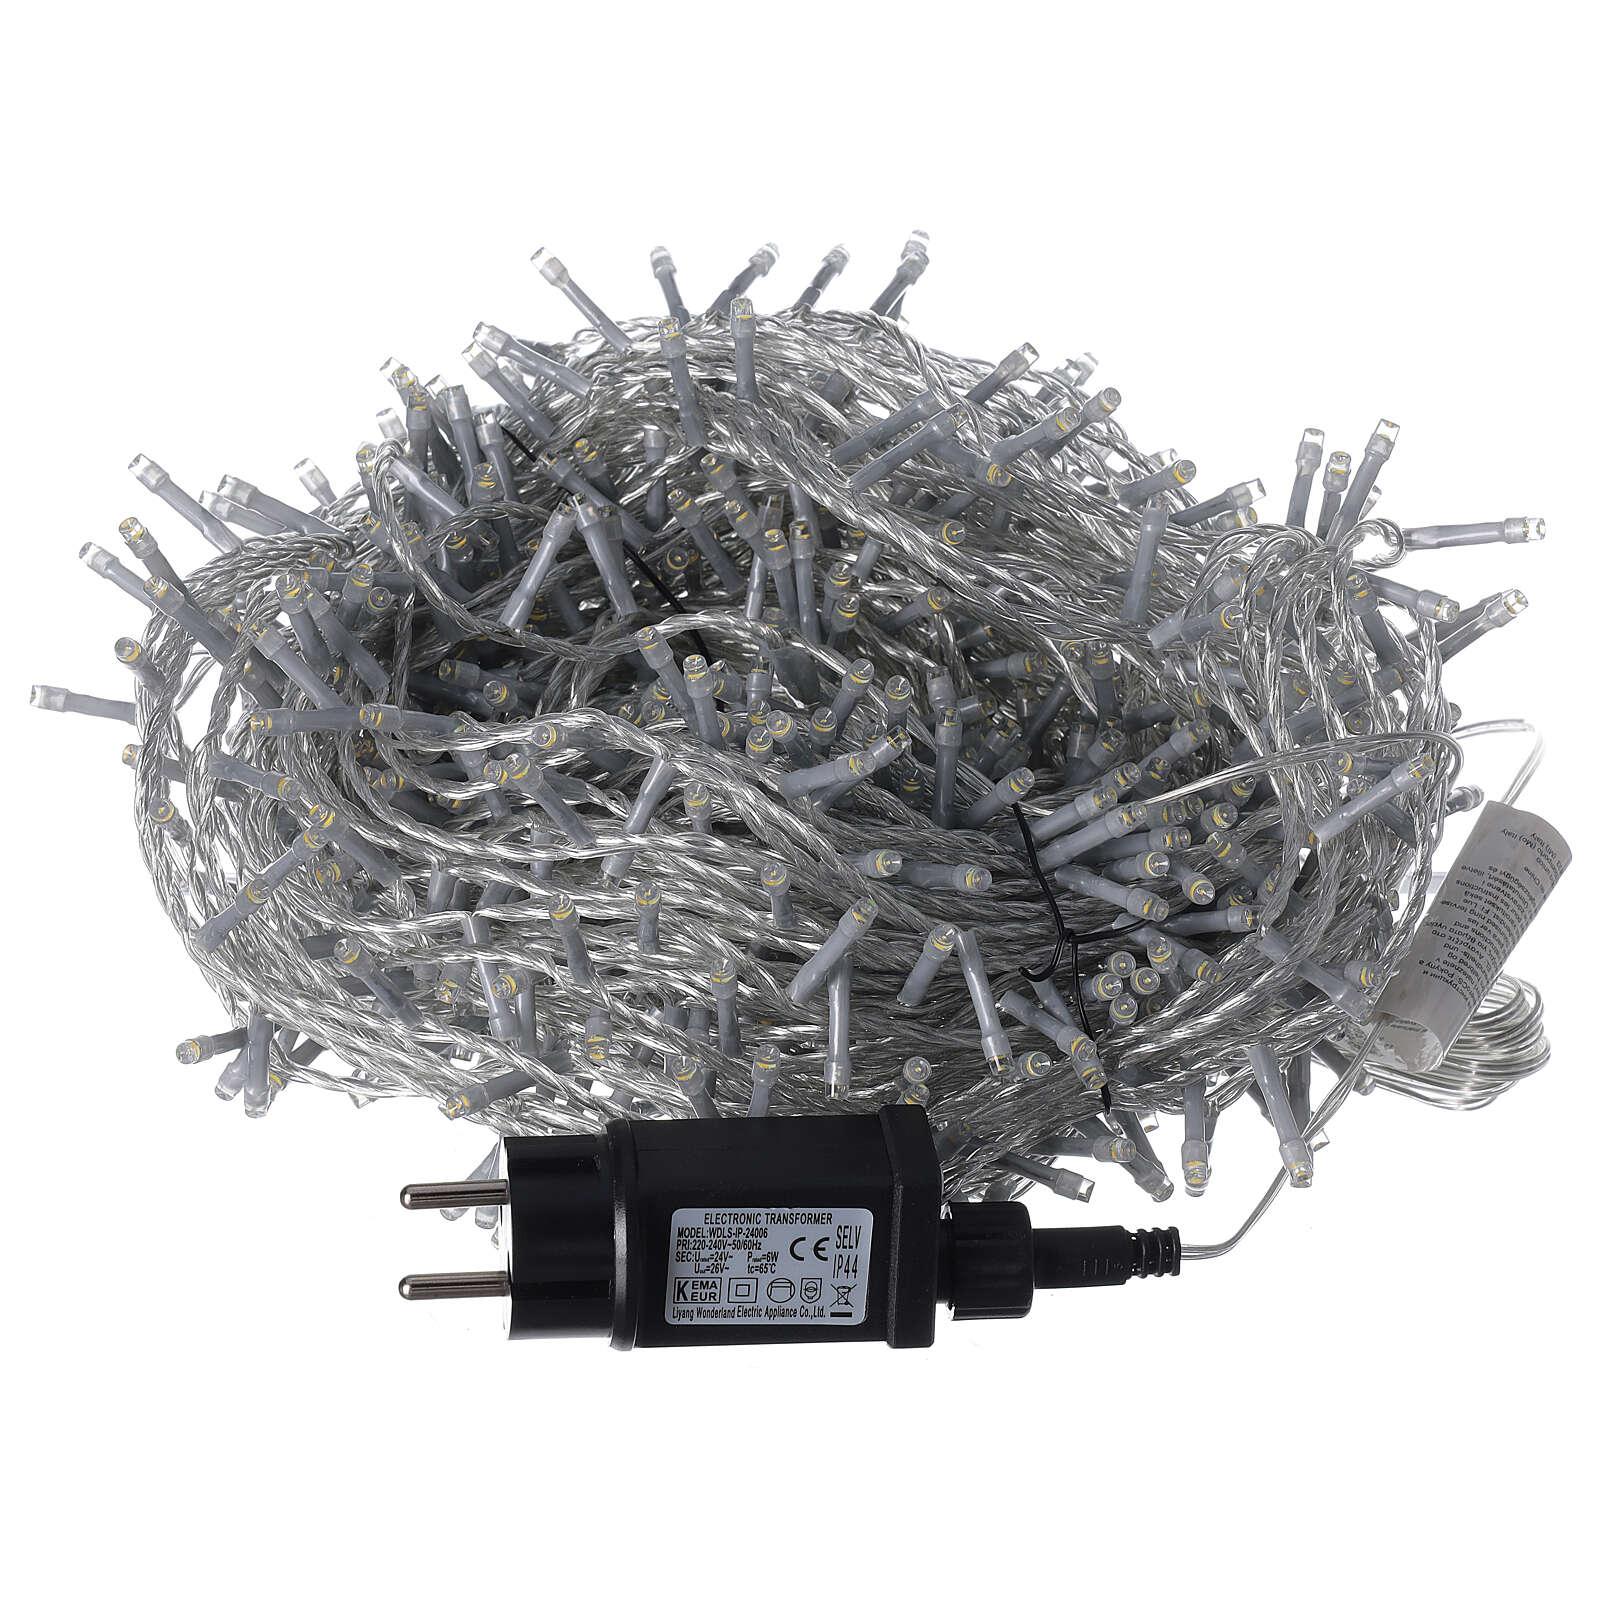 Cadena LED 800 luces 2 en 1 blanco cálido frío cable transparente 56 m int ext 3